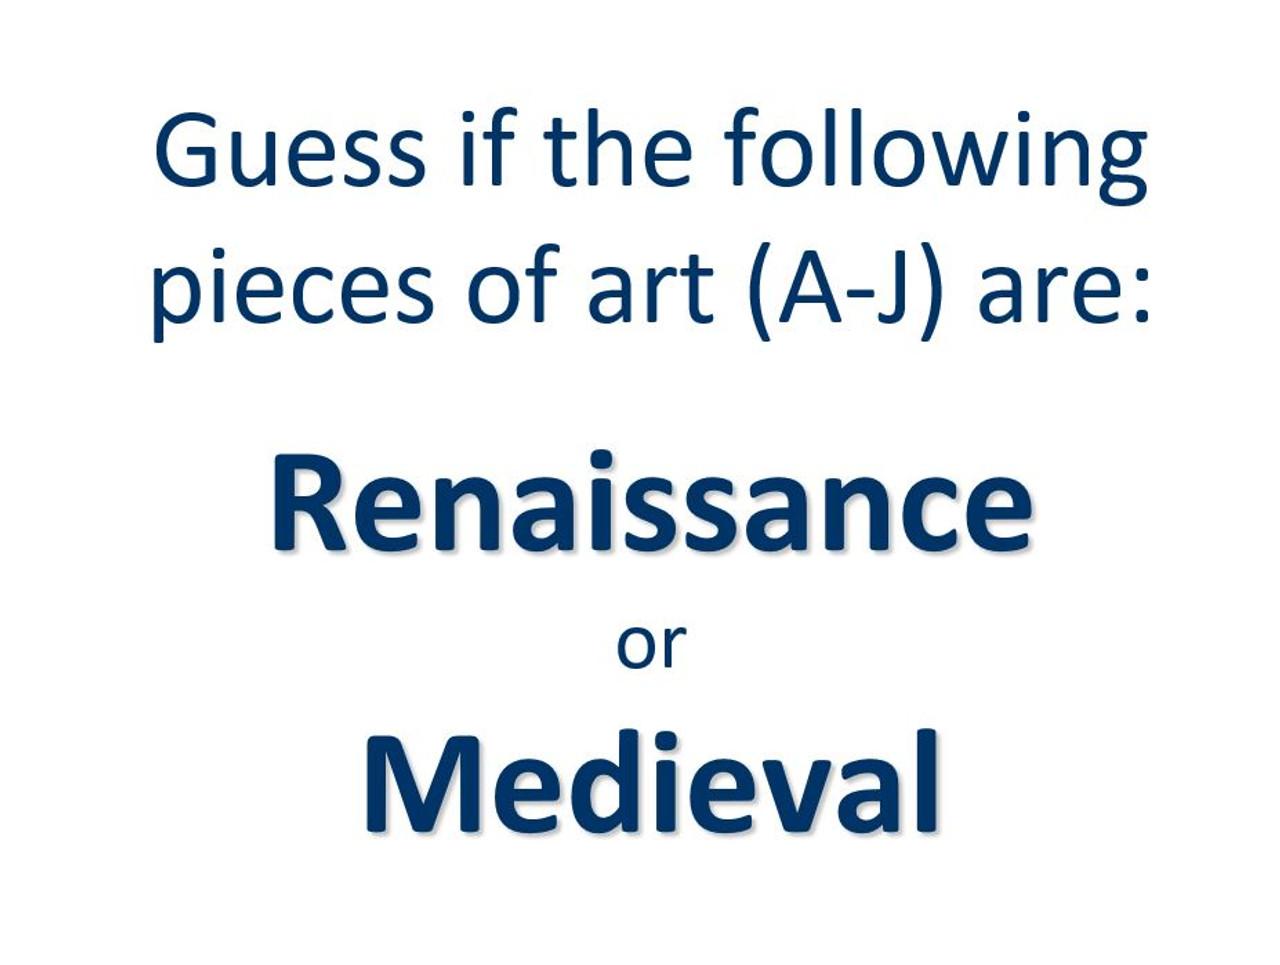 Artists of the Renaissance